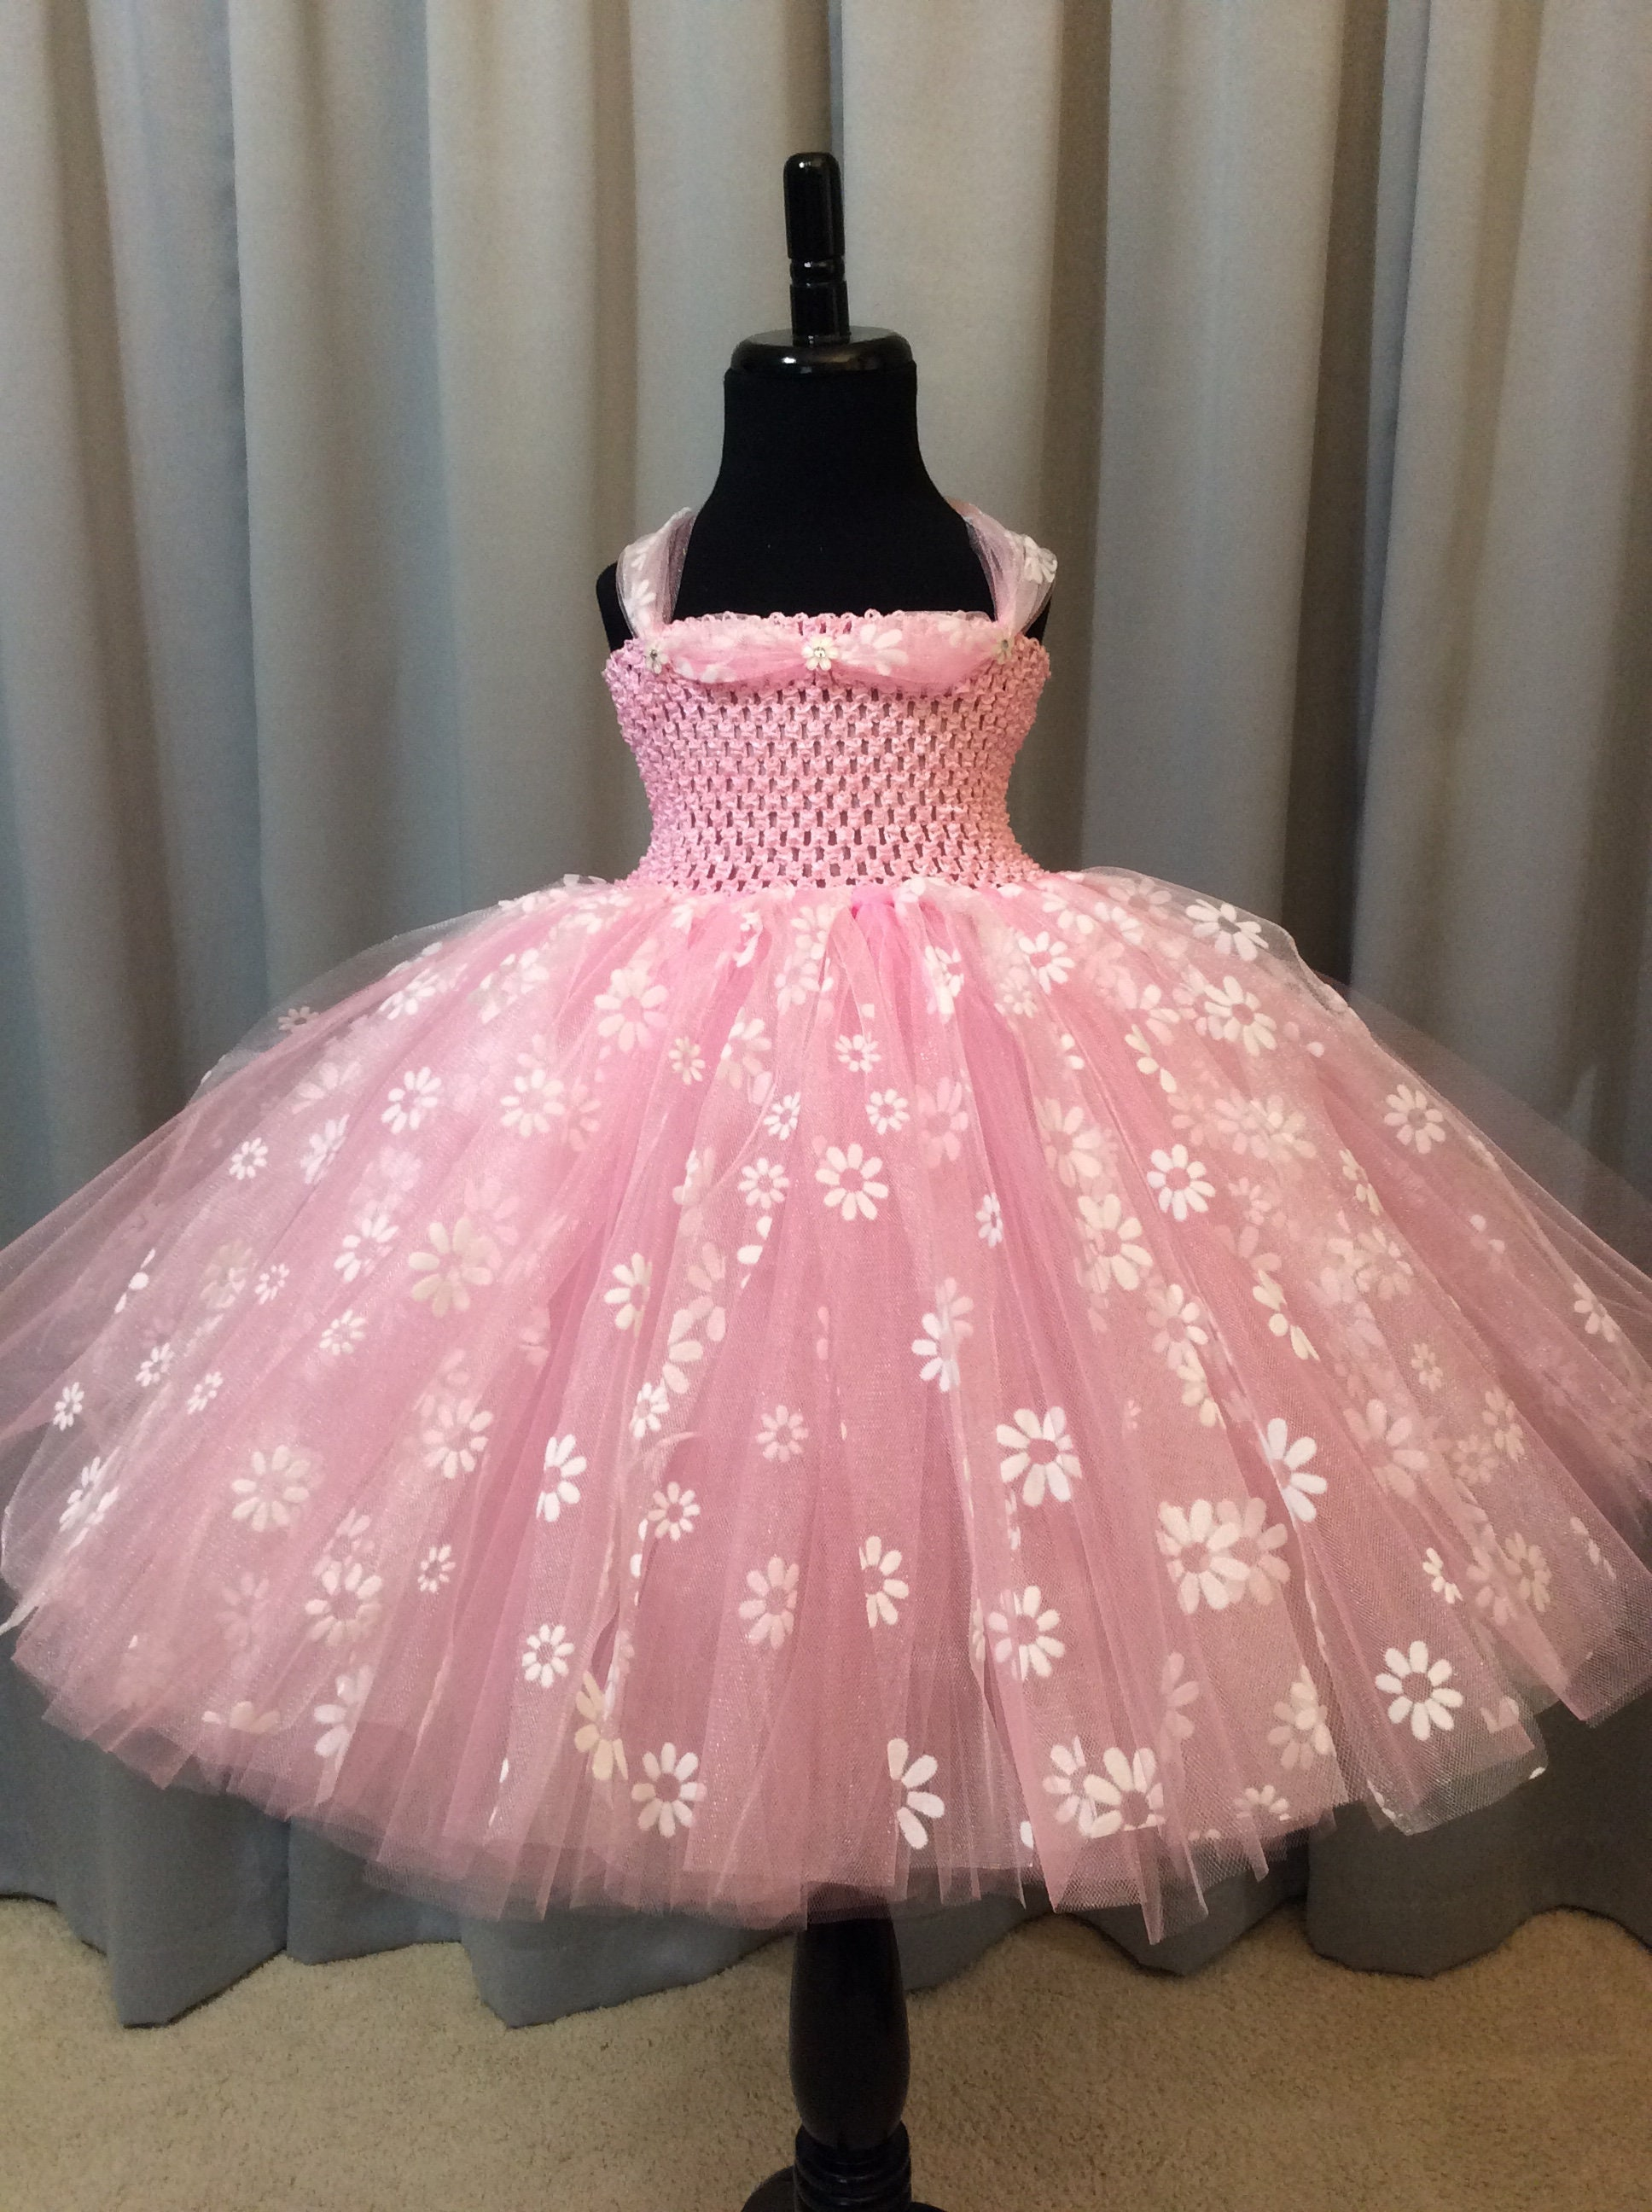 Pink Princess Tutu Dress With White Flowers Birthday Dress Etsy